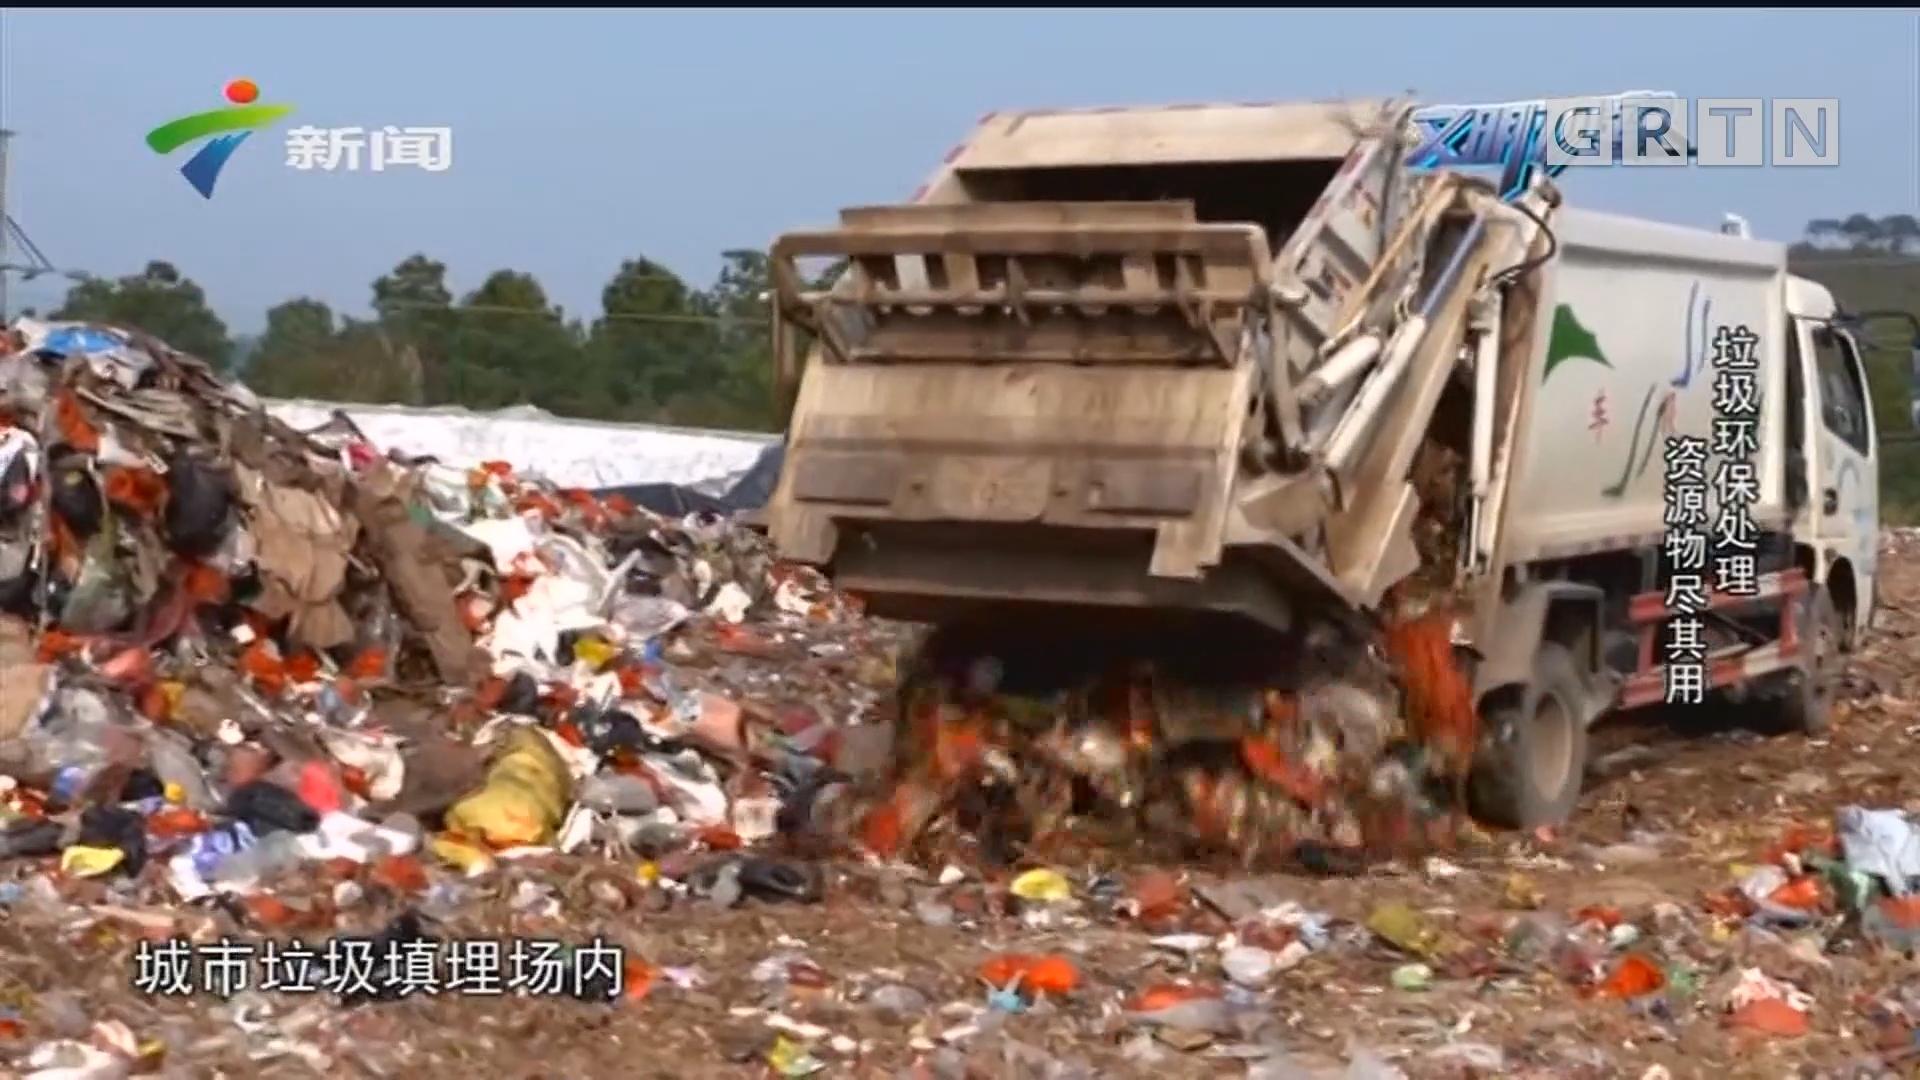 [HD][2019-07-06]文明觀察:垃圾環保處理 資源物盡其用